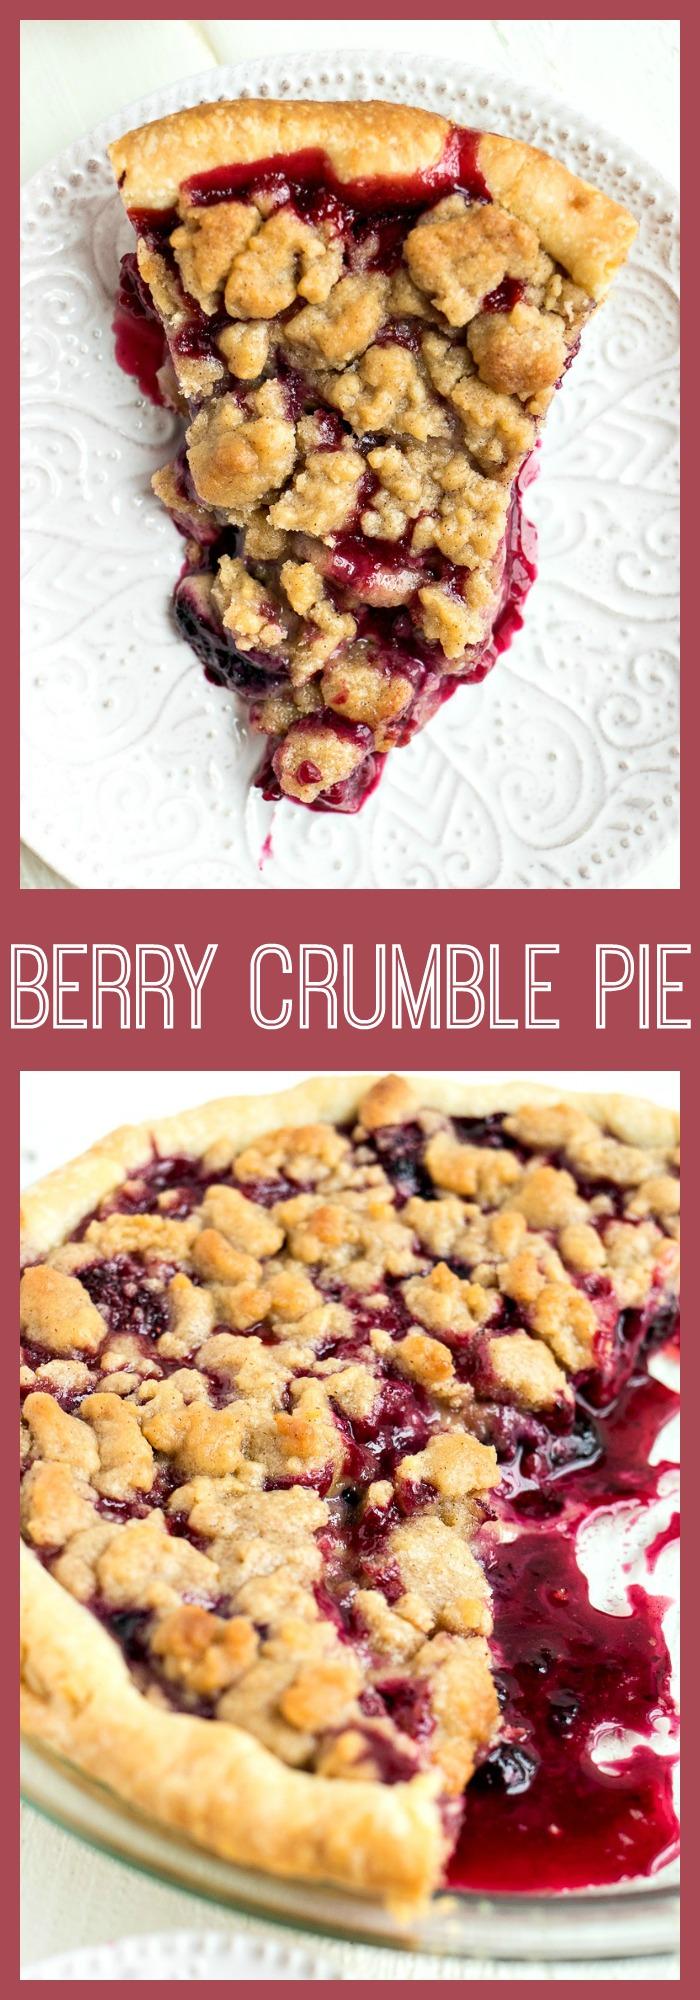 Berry Crumble Pie photo collage